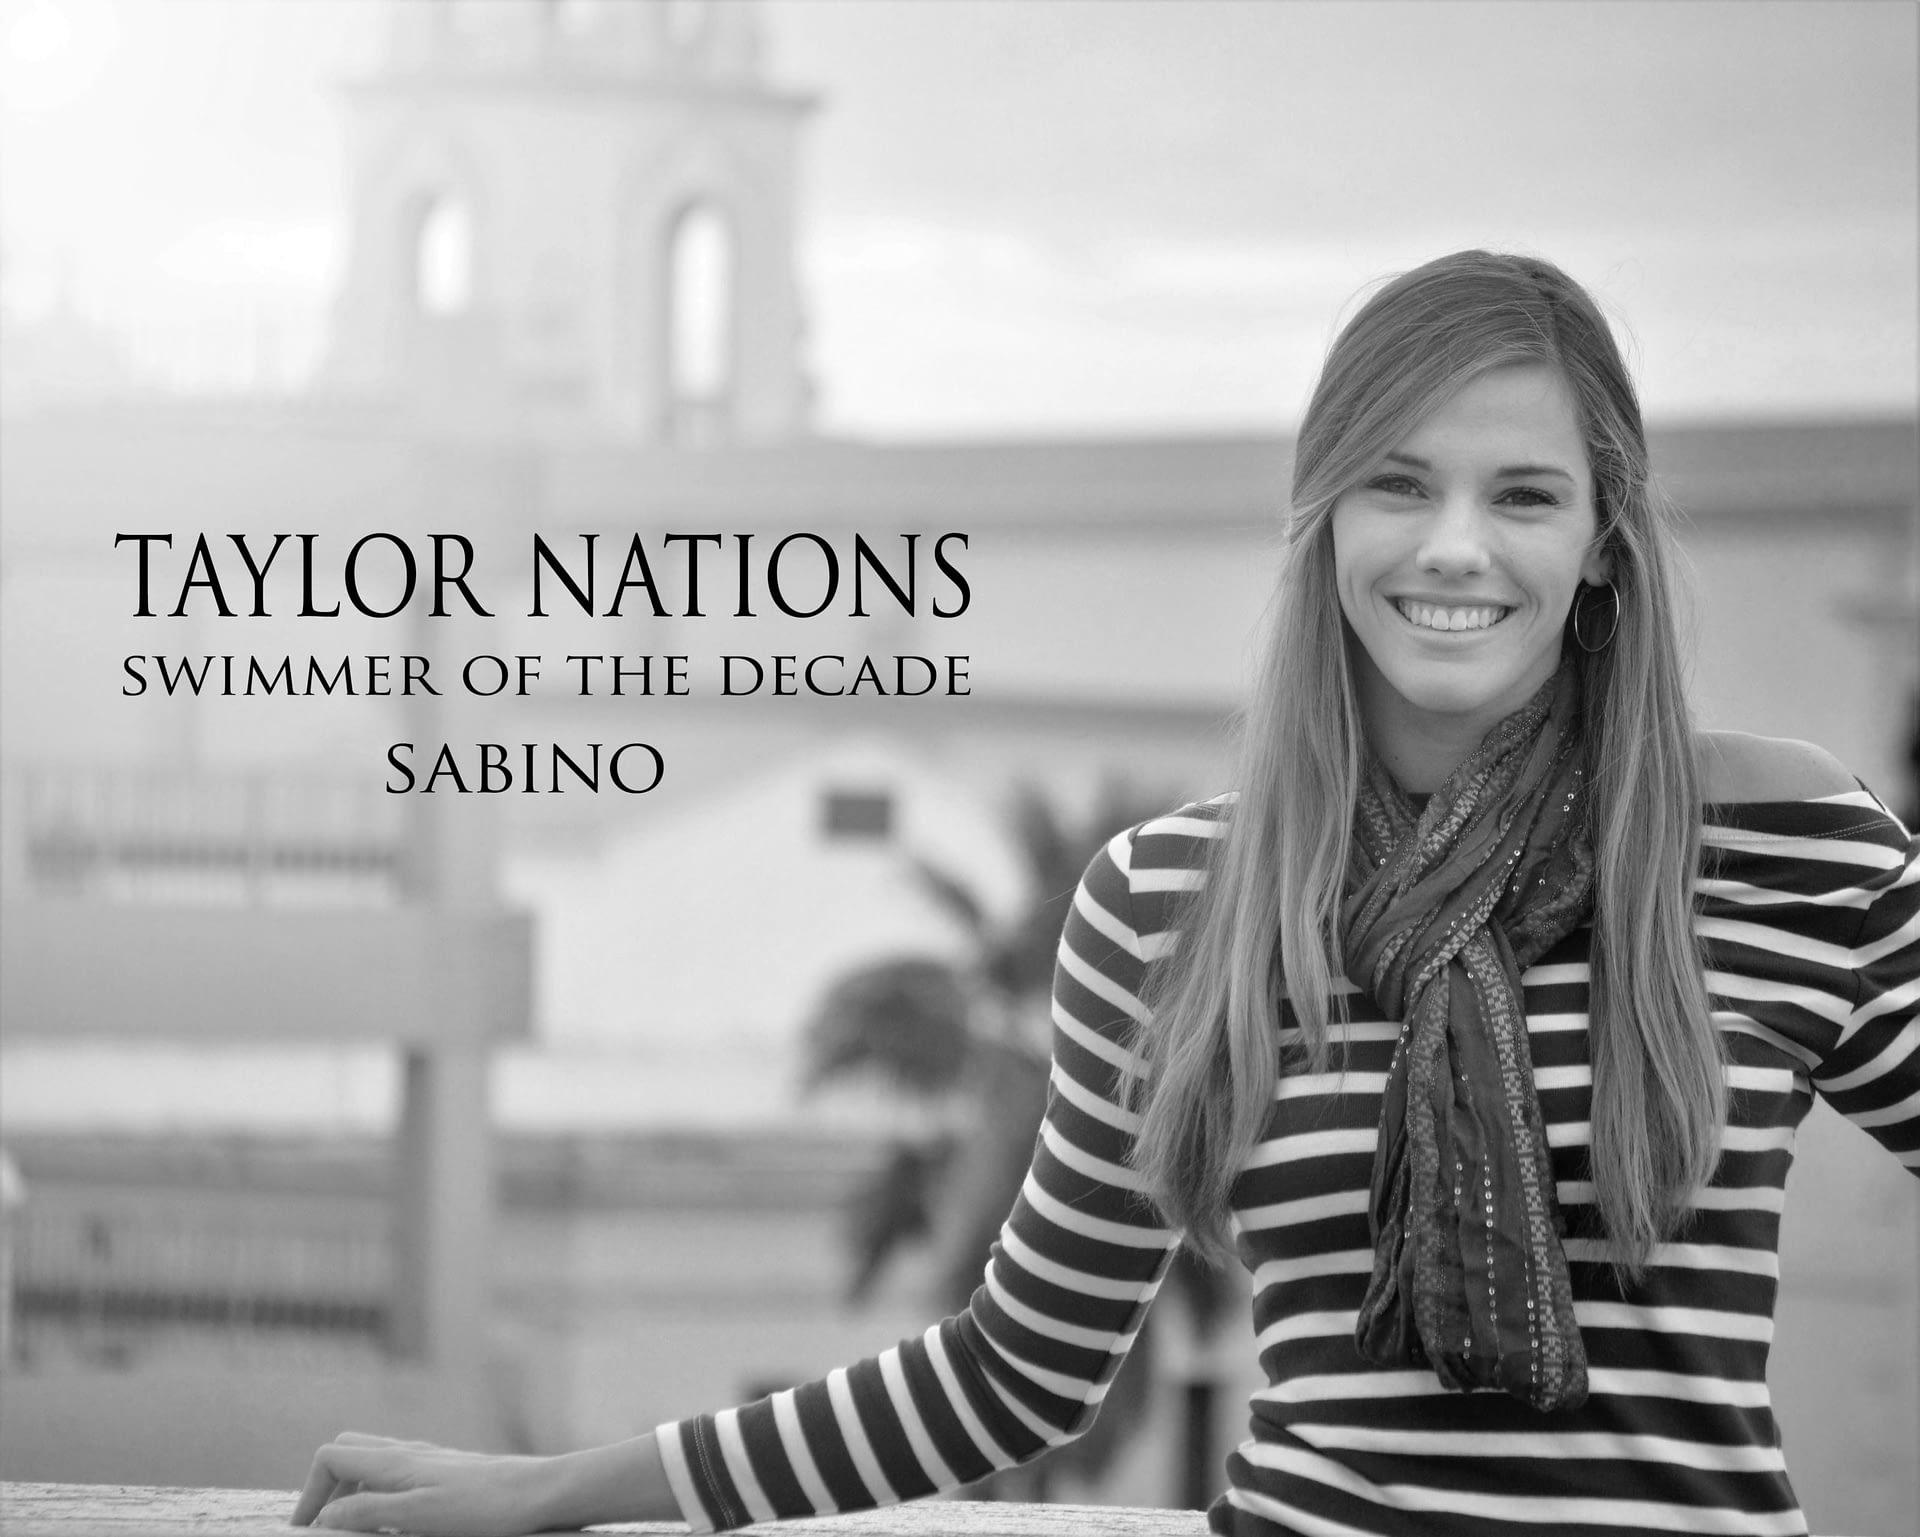 taylor-nations-decade